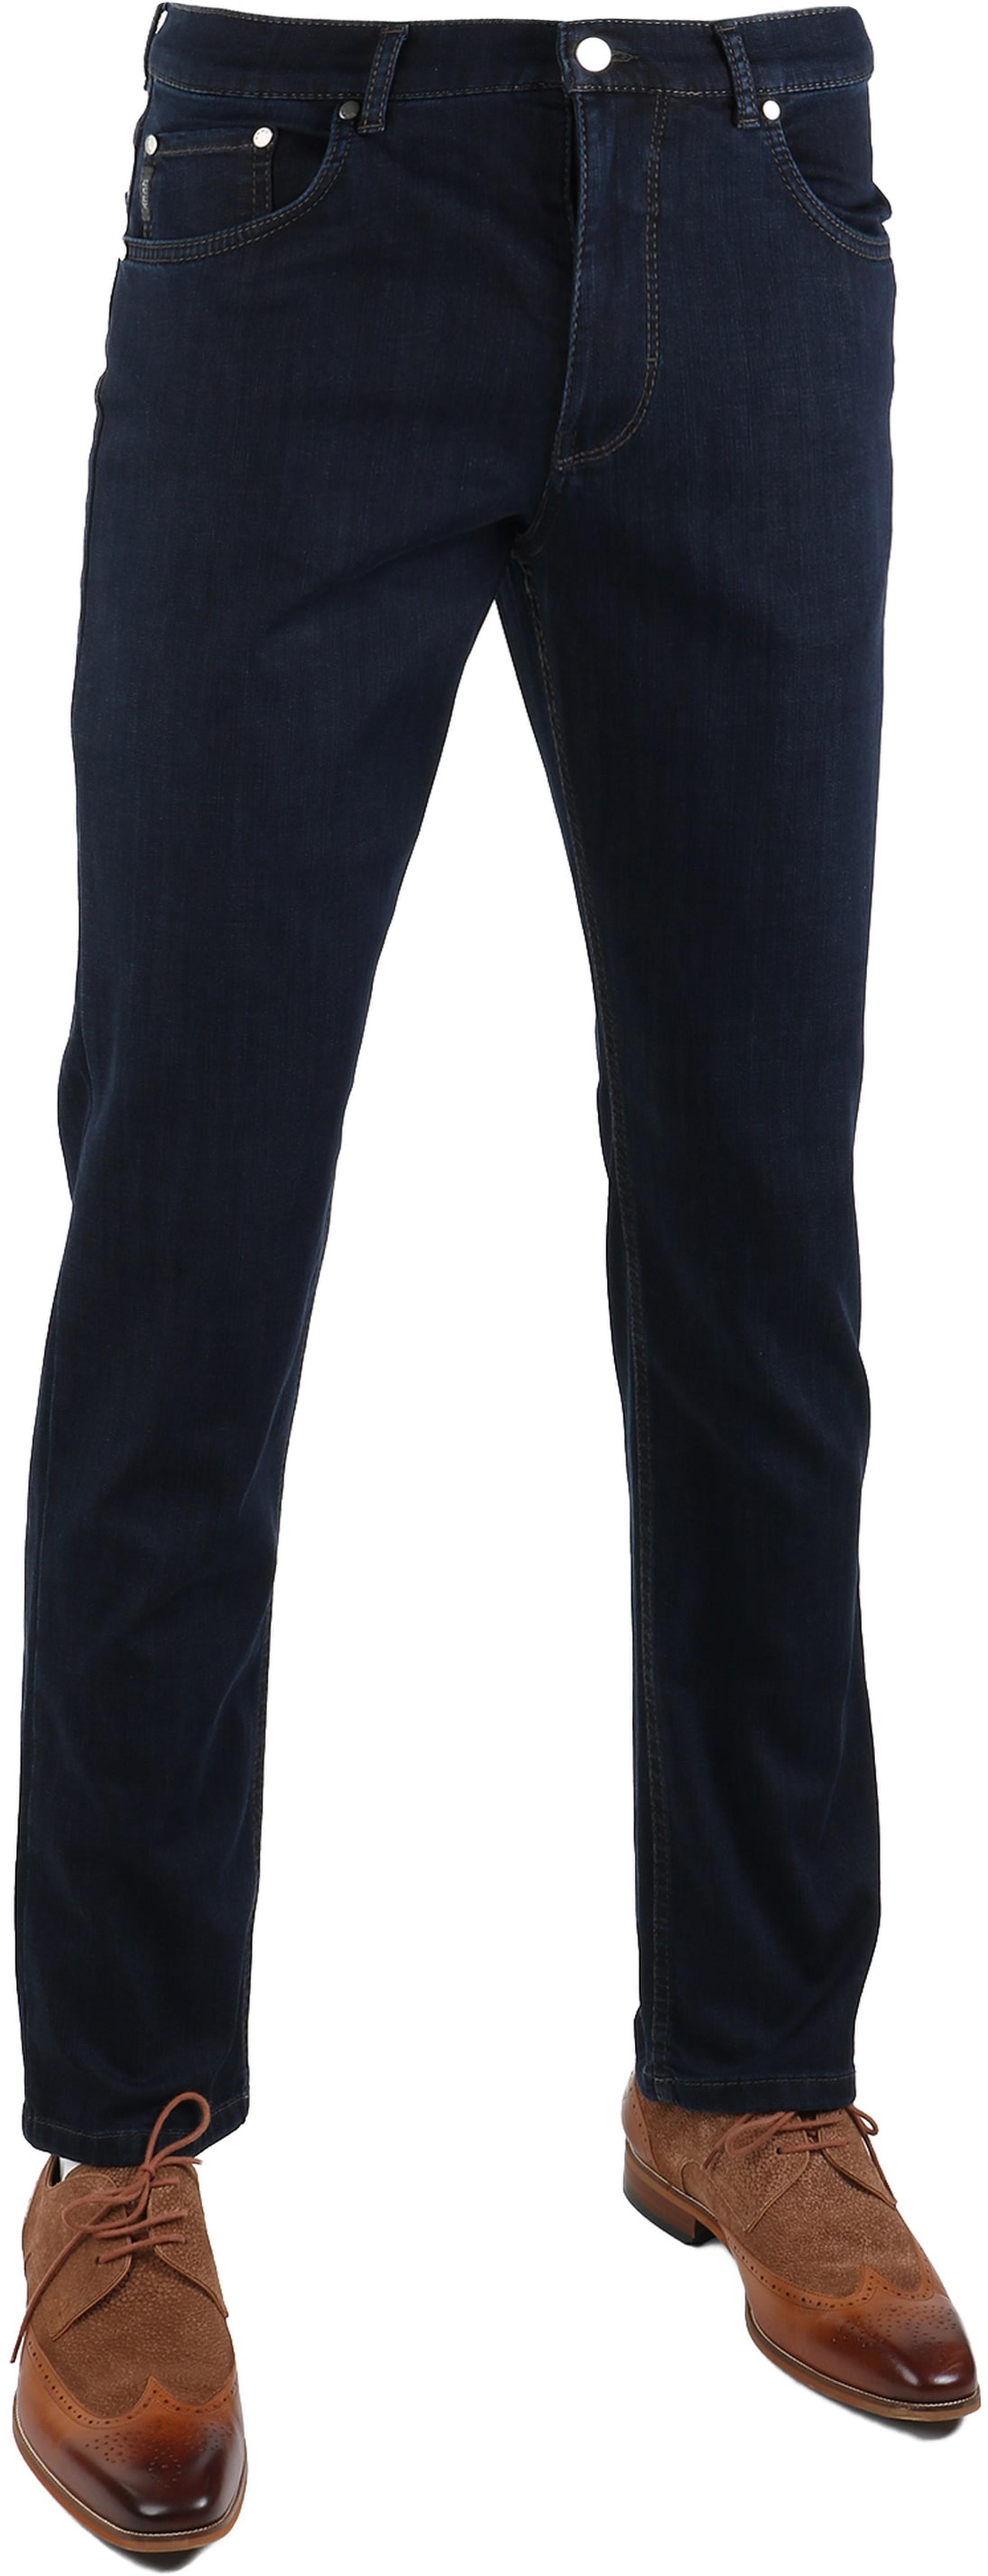 footwear latest nice cheap Brax Cooper Denim Jeans Dark Five Pocket 80-3000 07964420 ...